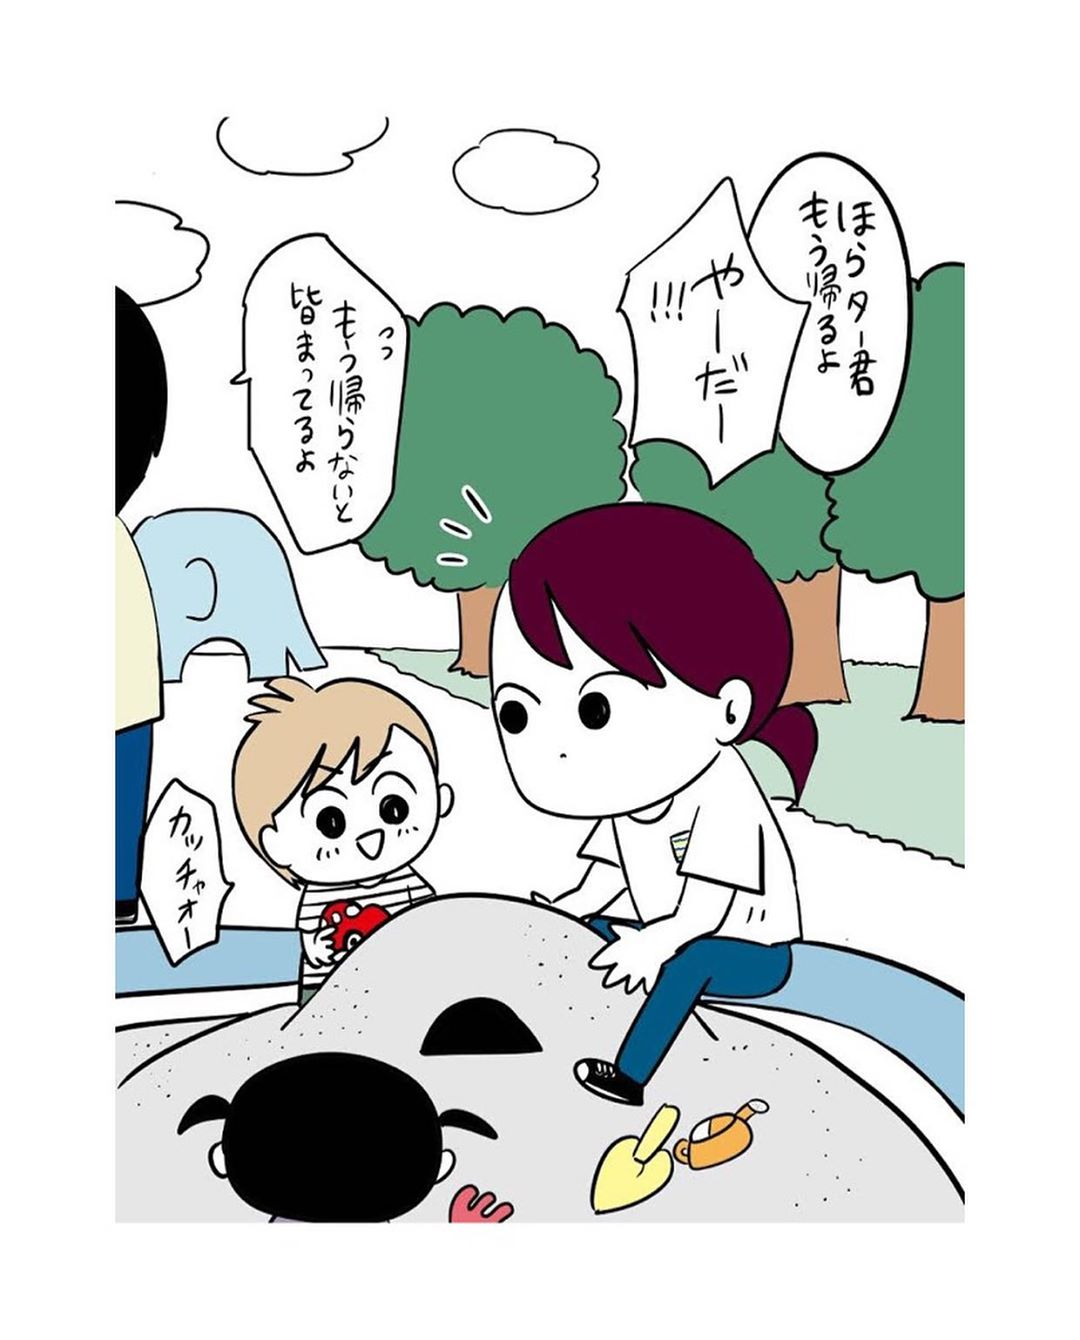 shirota.yunya_71873395_648308332372481_2967098083640779905_n